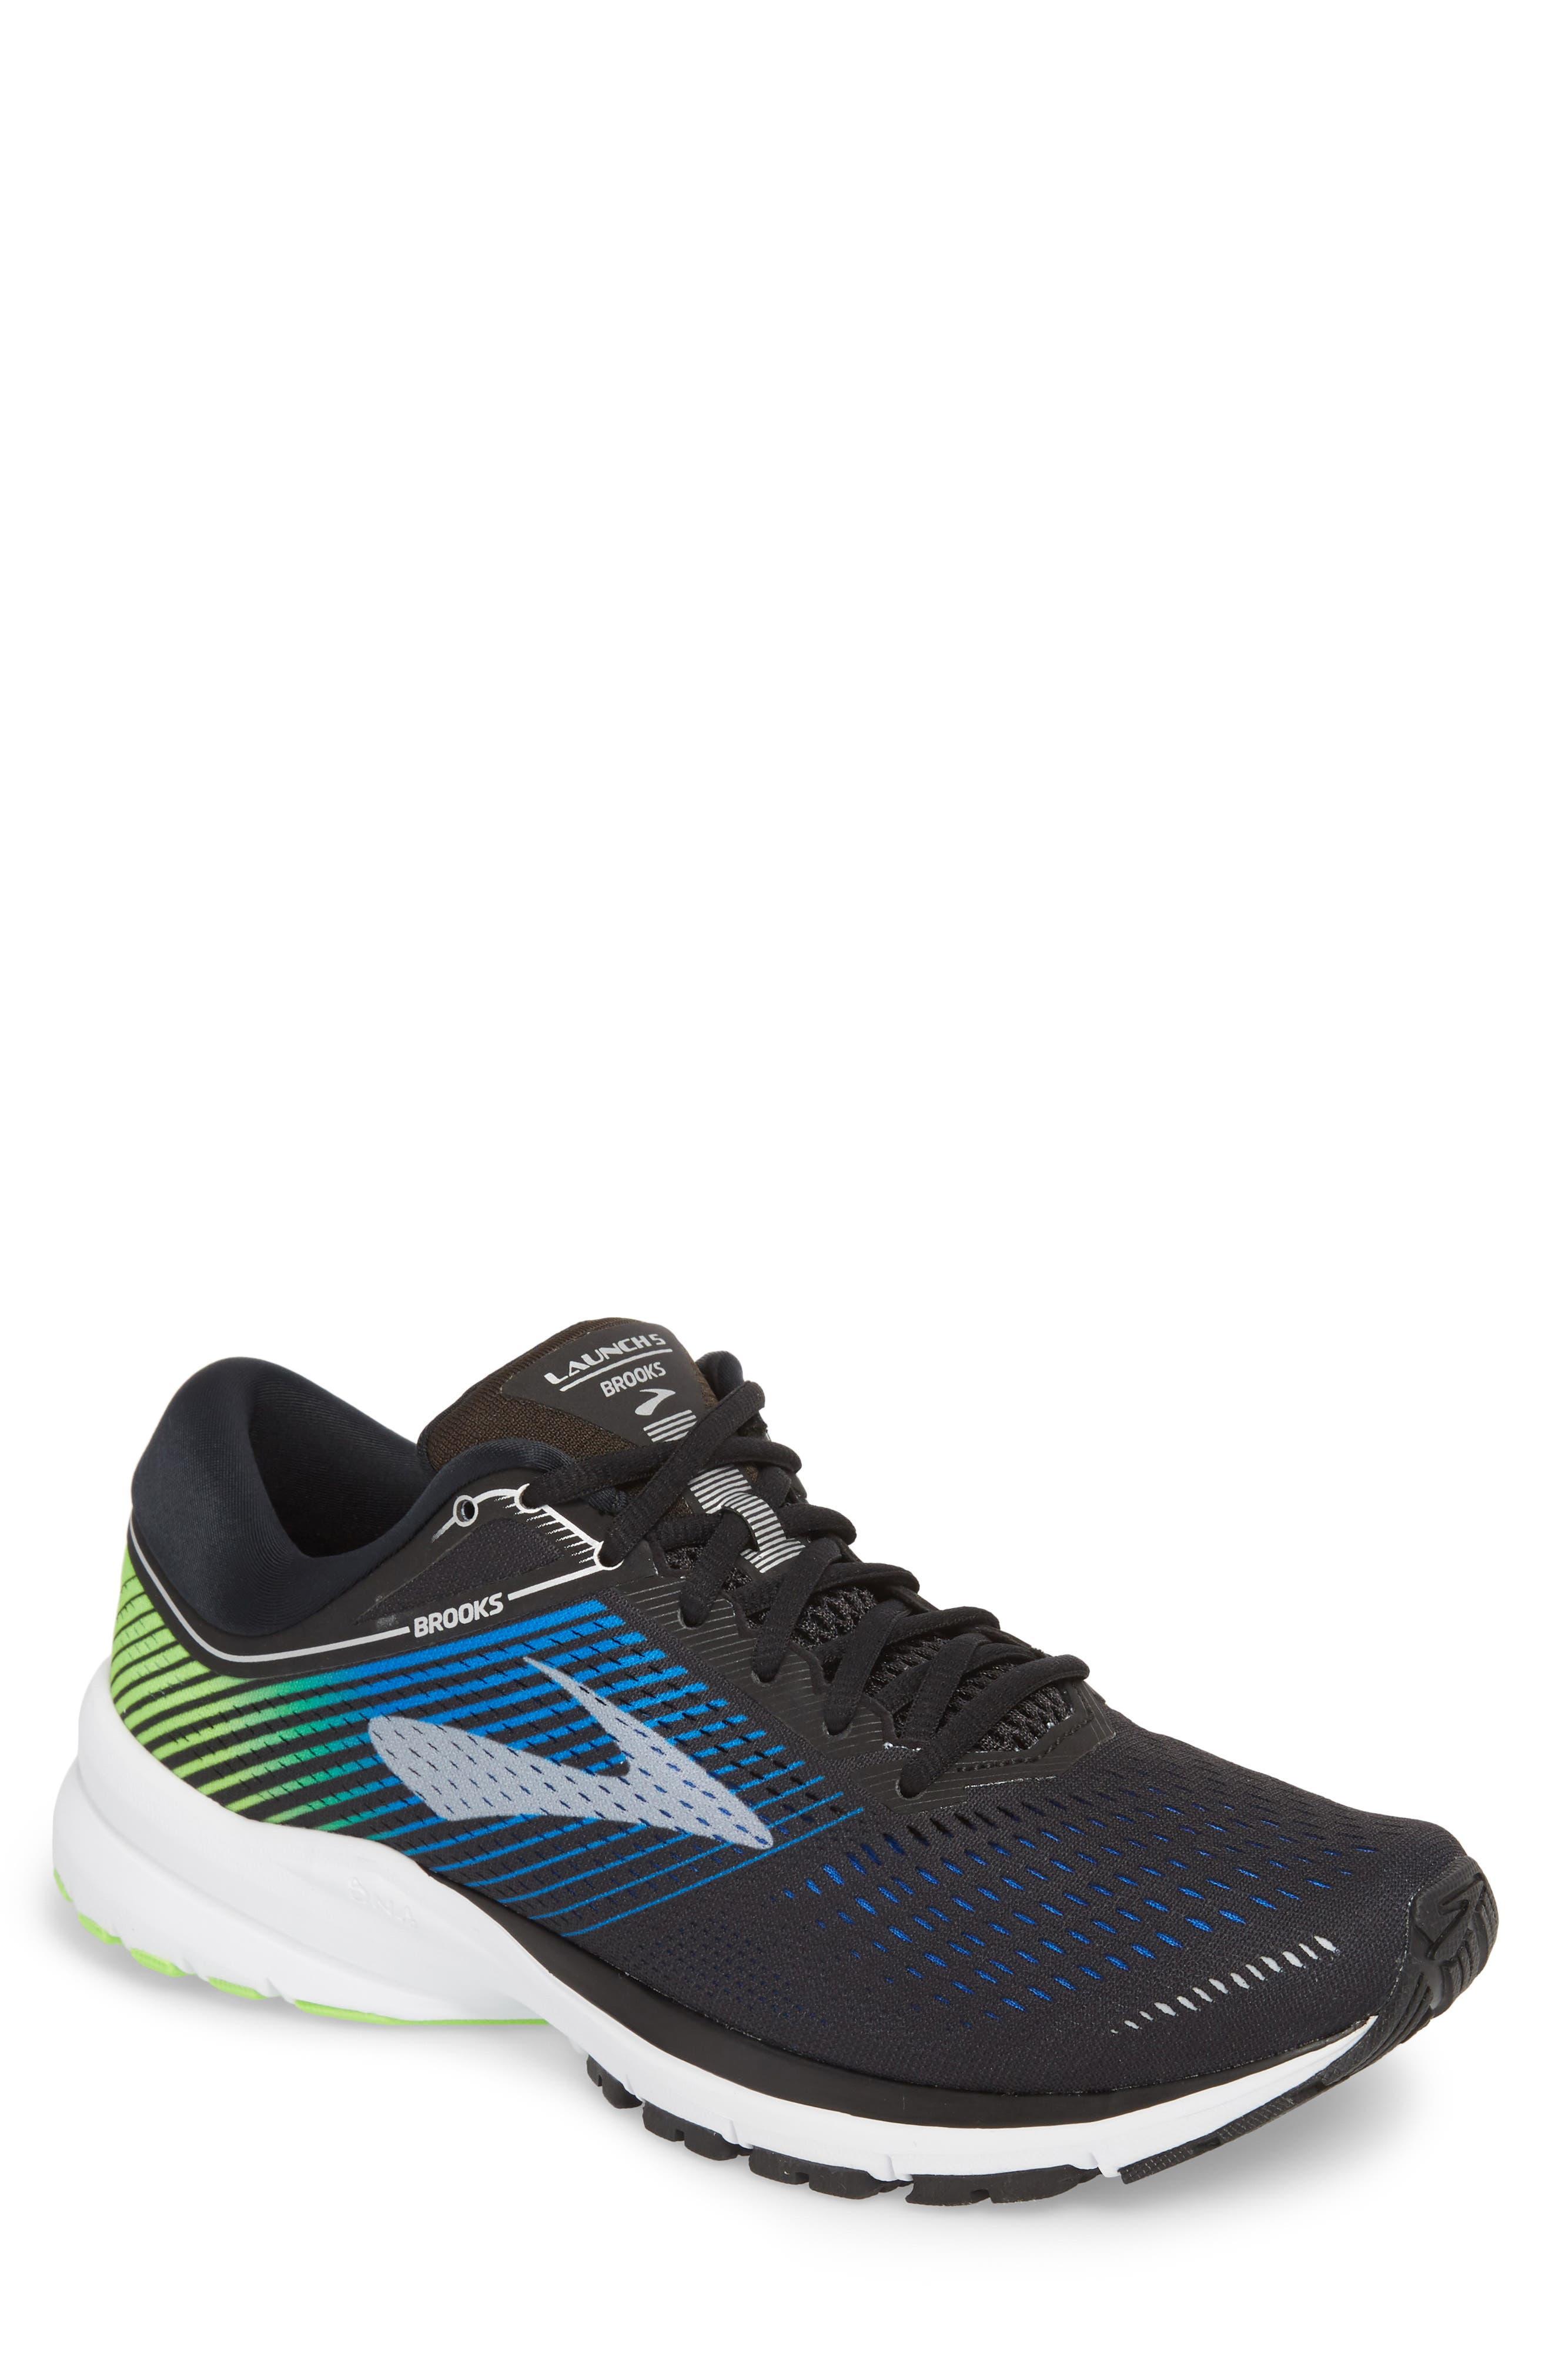 Launch 5 Running Shoe,                         Main,                         color, Black/ Blue/ Green